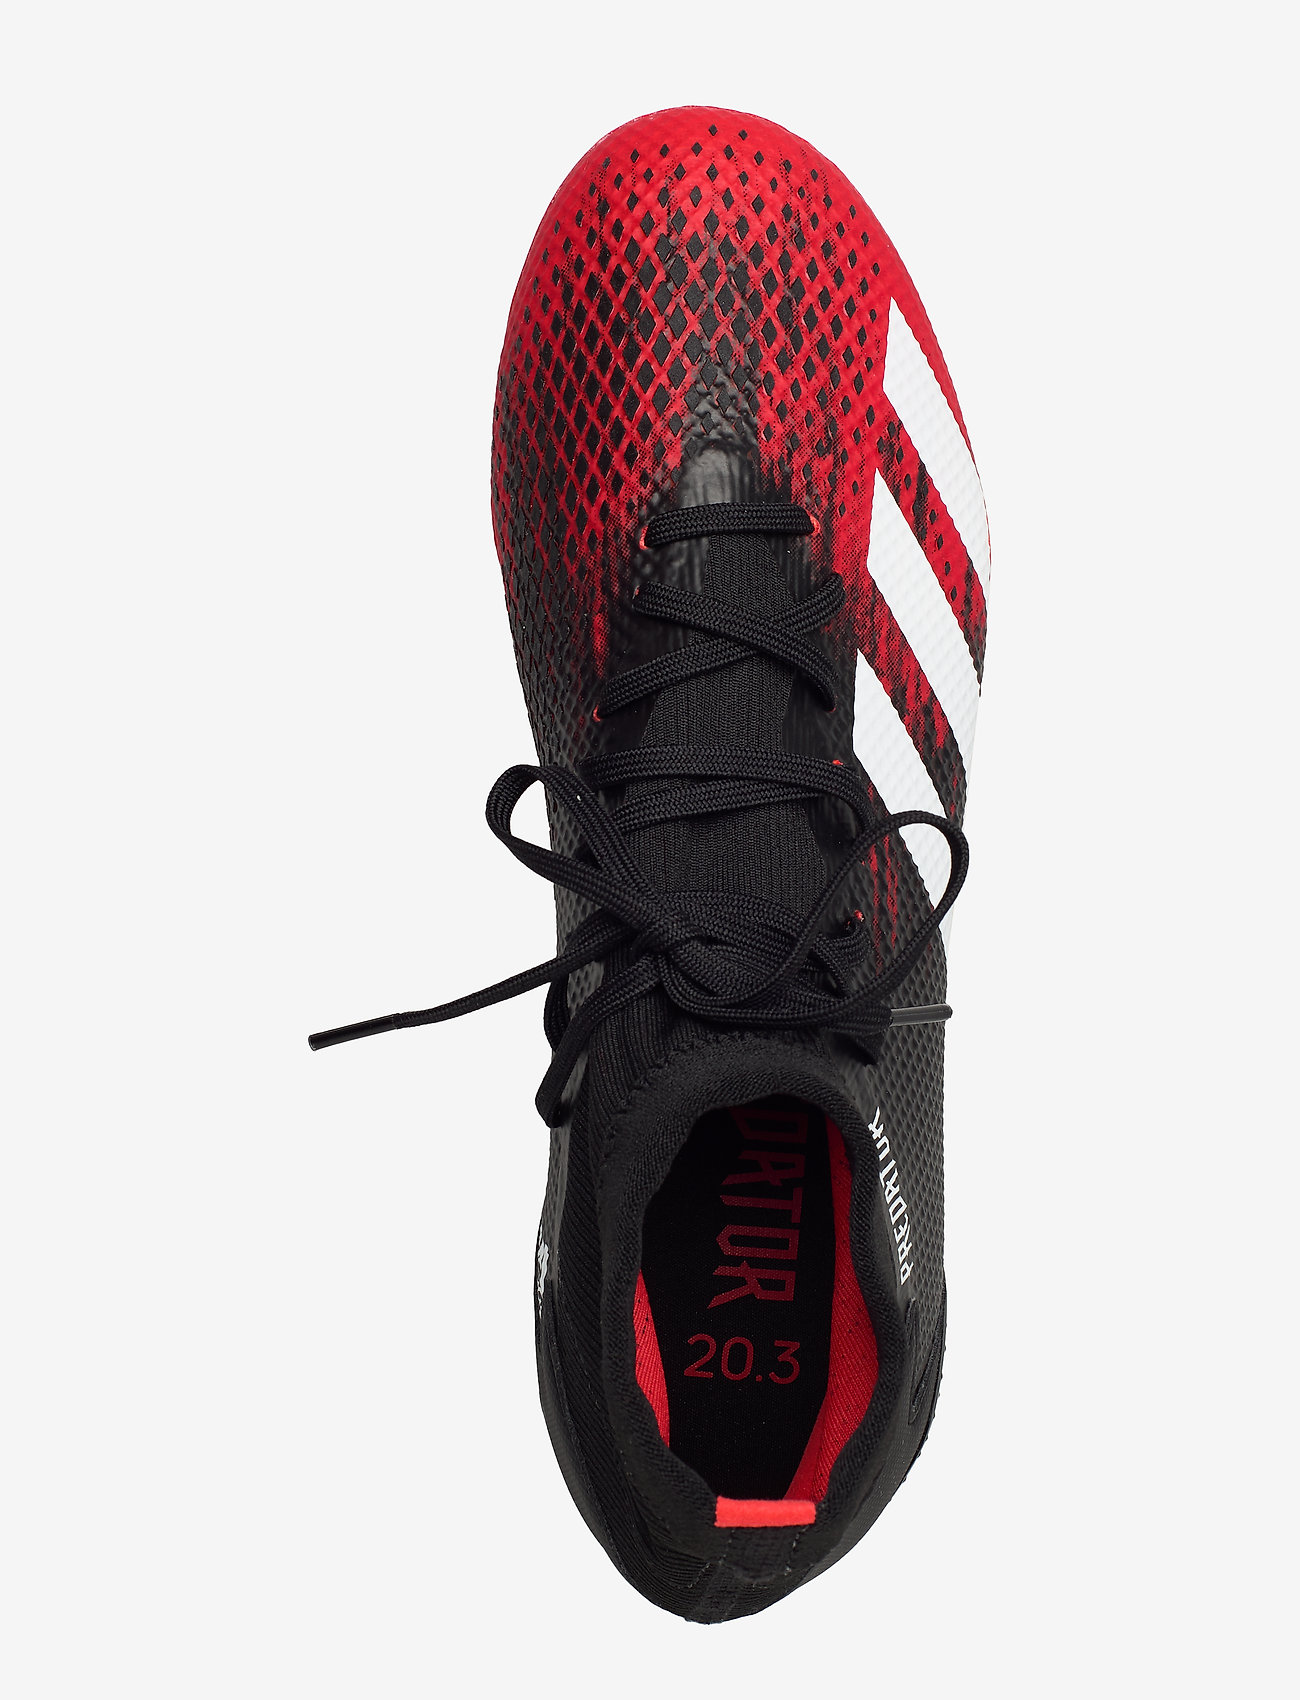 Predator 20.3 Fg (Cblack/ftwwht/actred) - adidas Performance